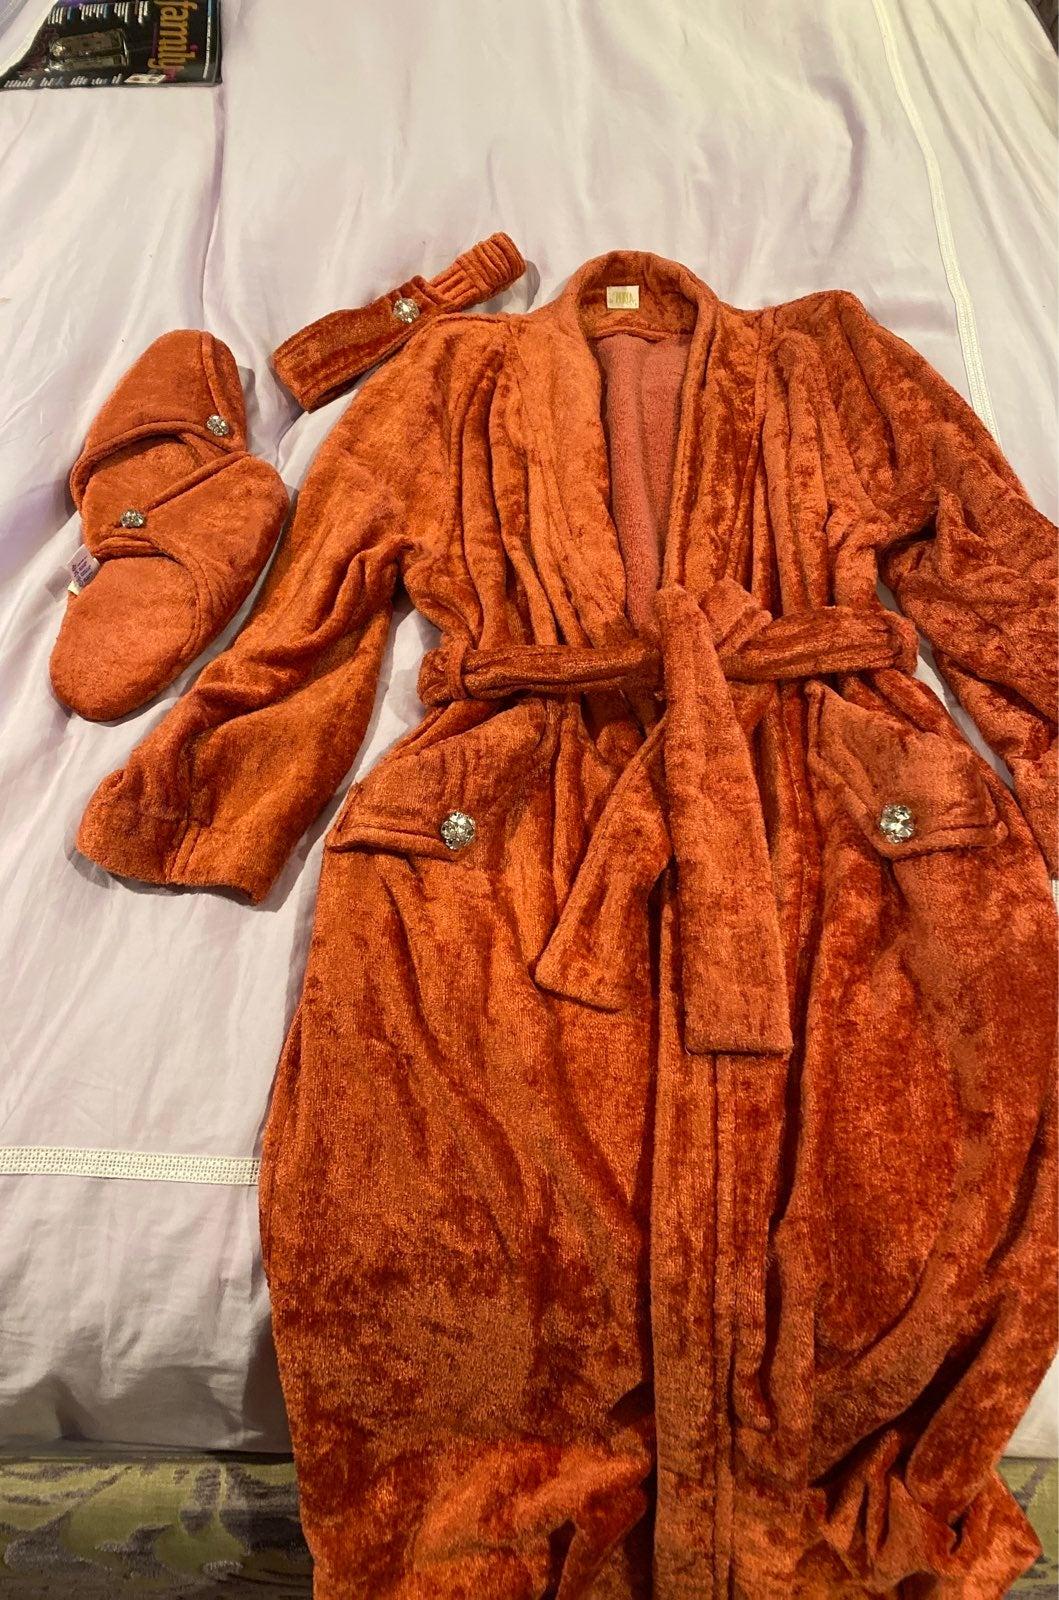 Robe, Gently used gorgeous La Perla apri